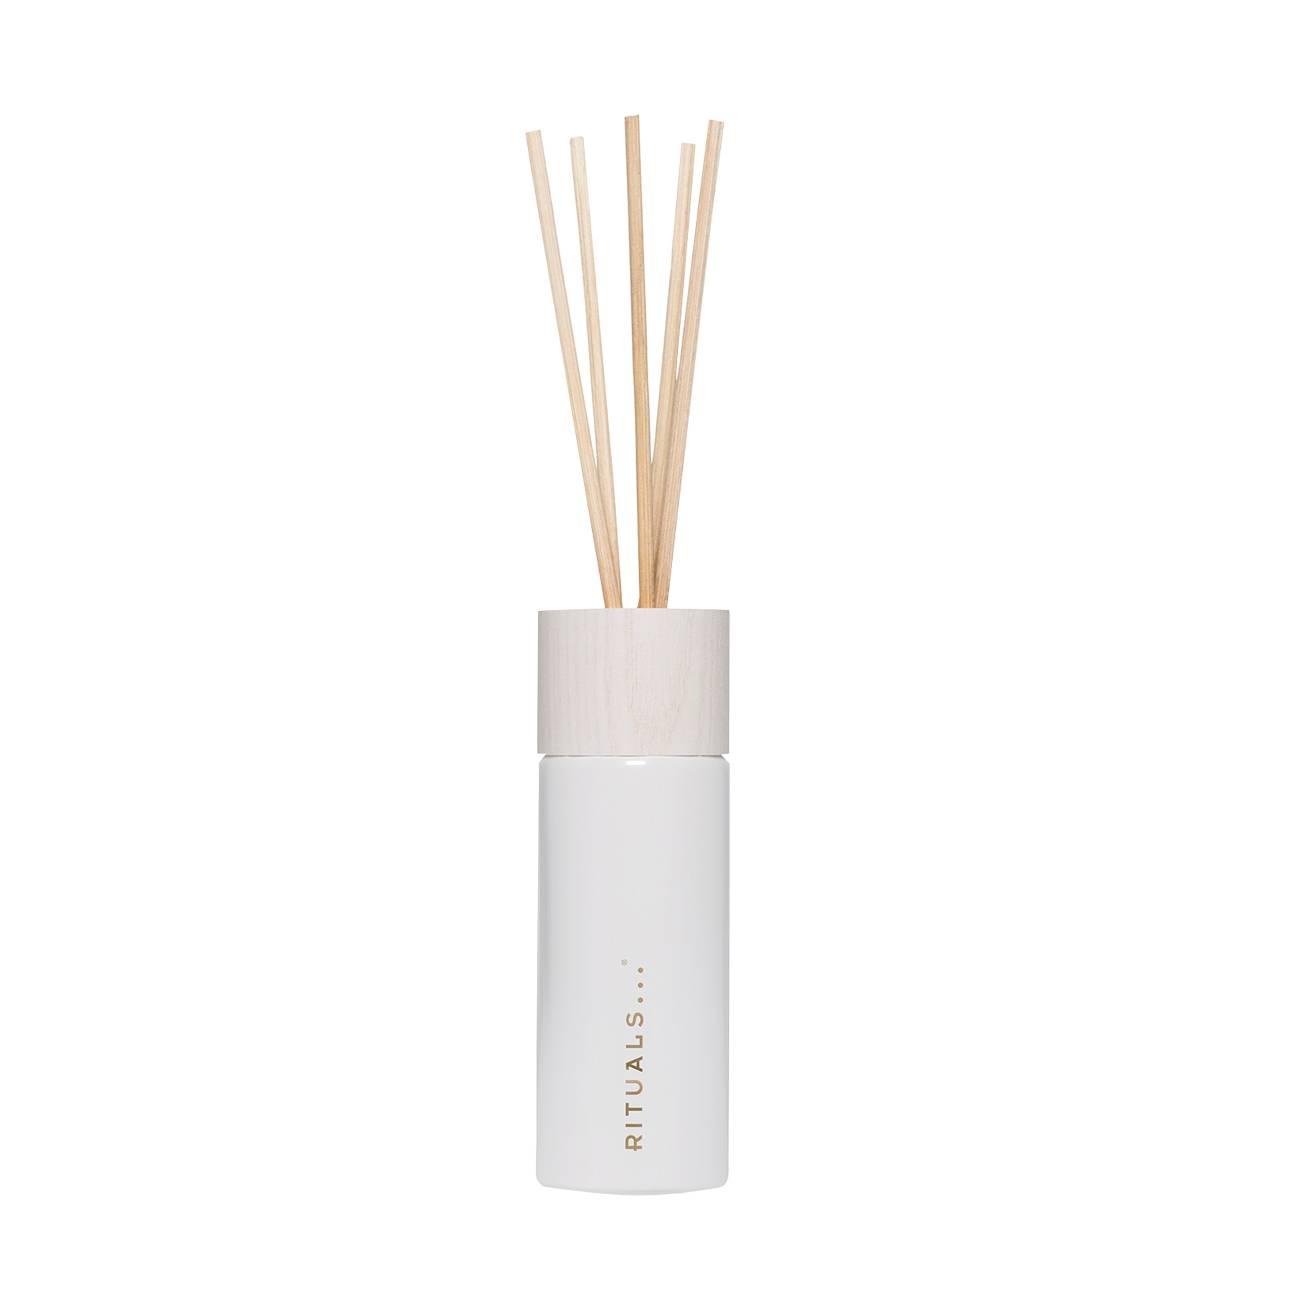 Sakura Mini Fragrance Sticks 50ml Rituals imagine 2021 bestvalue.eu